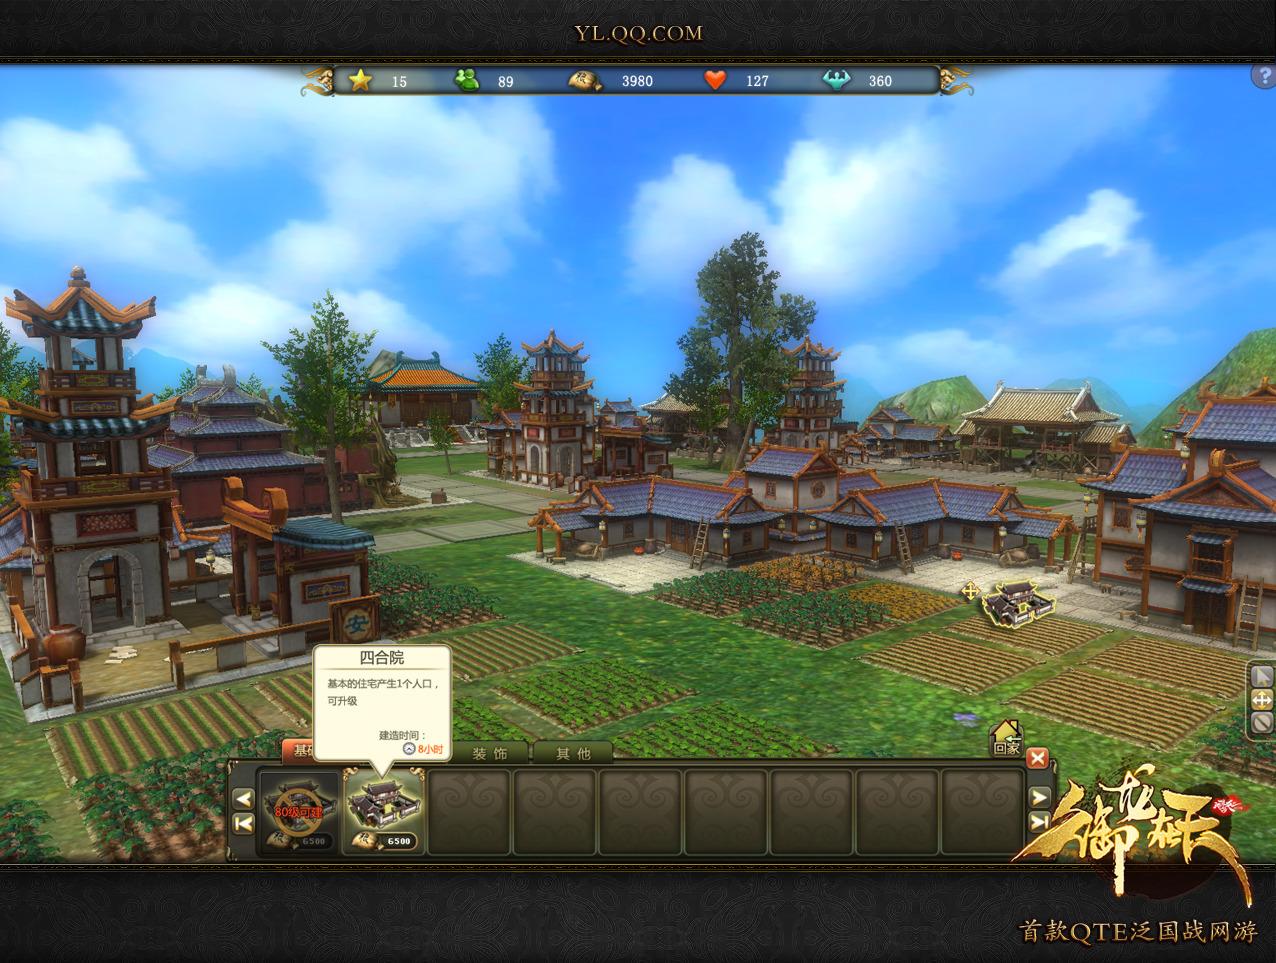 3d曲面是御龙在天里为每位边界v曲面的一块儿cad中玩家定绘制庄园如何图片